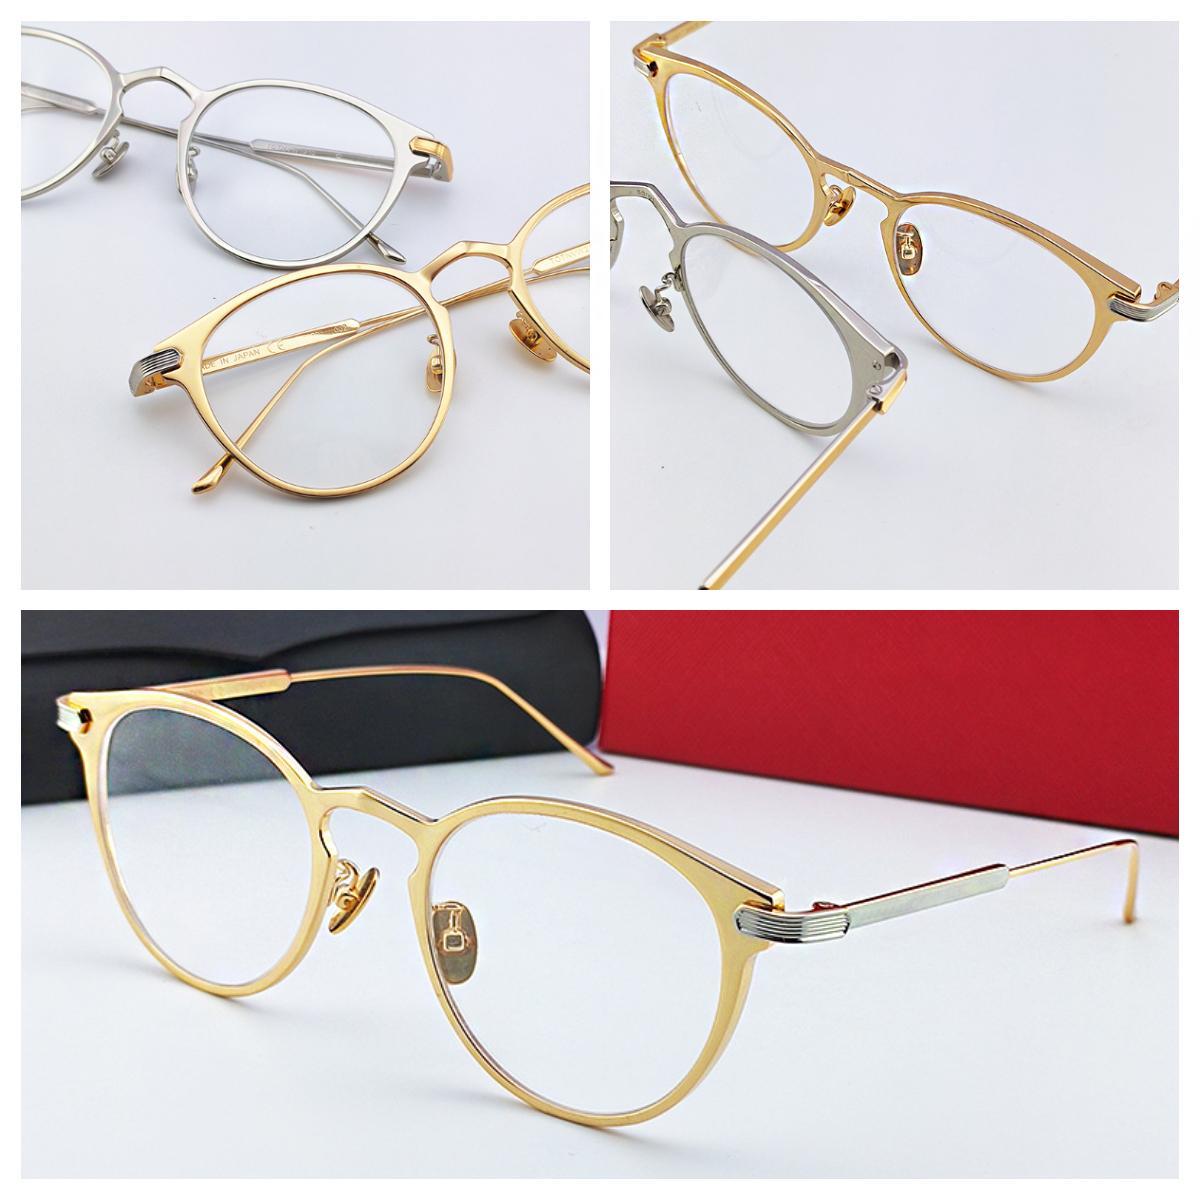 Mens luxury Transparent Glasses Eye outdoor Clear Glass Eyeglasses Myopia Presbyopia Vintage Prescription Optical Spectacle Frames 00210